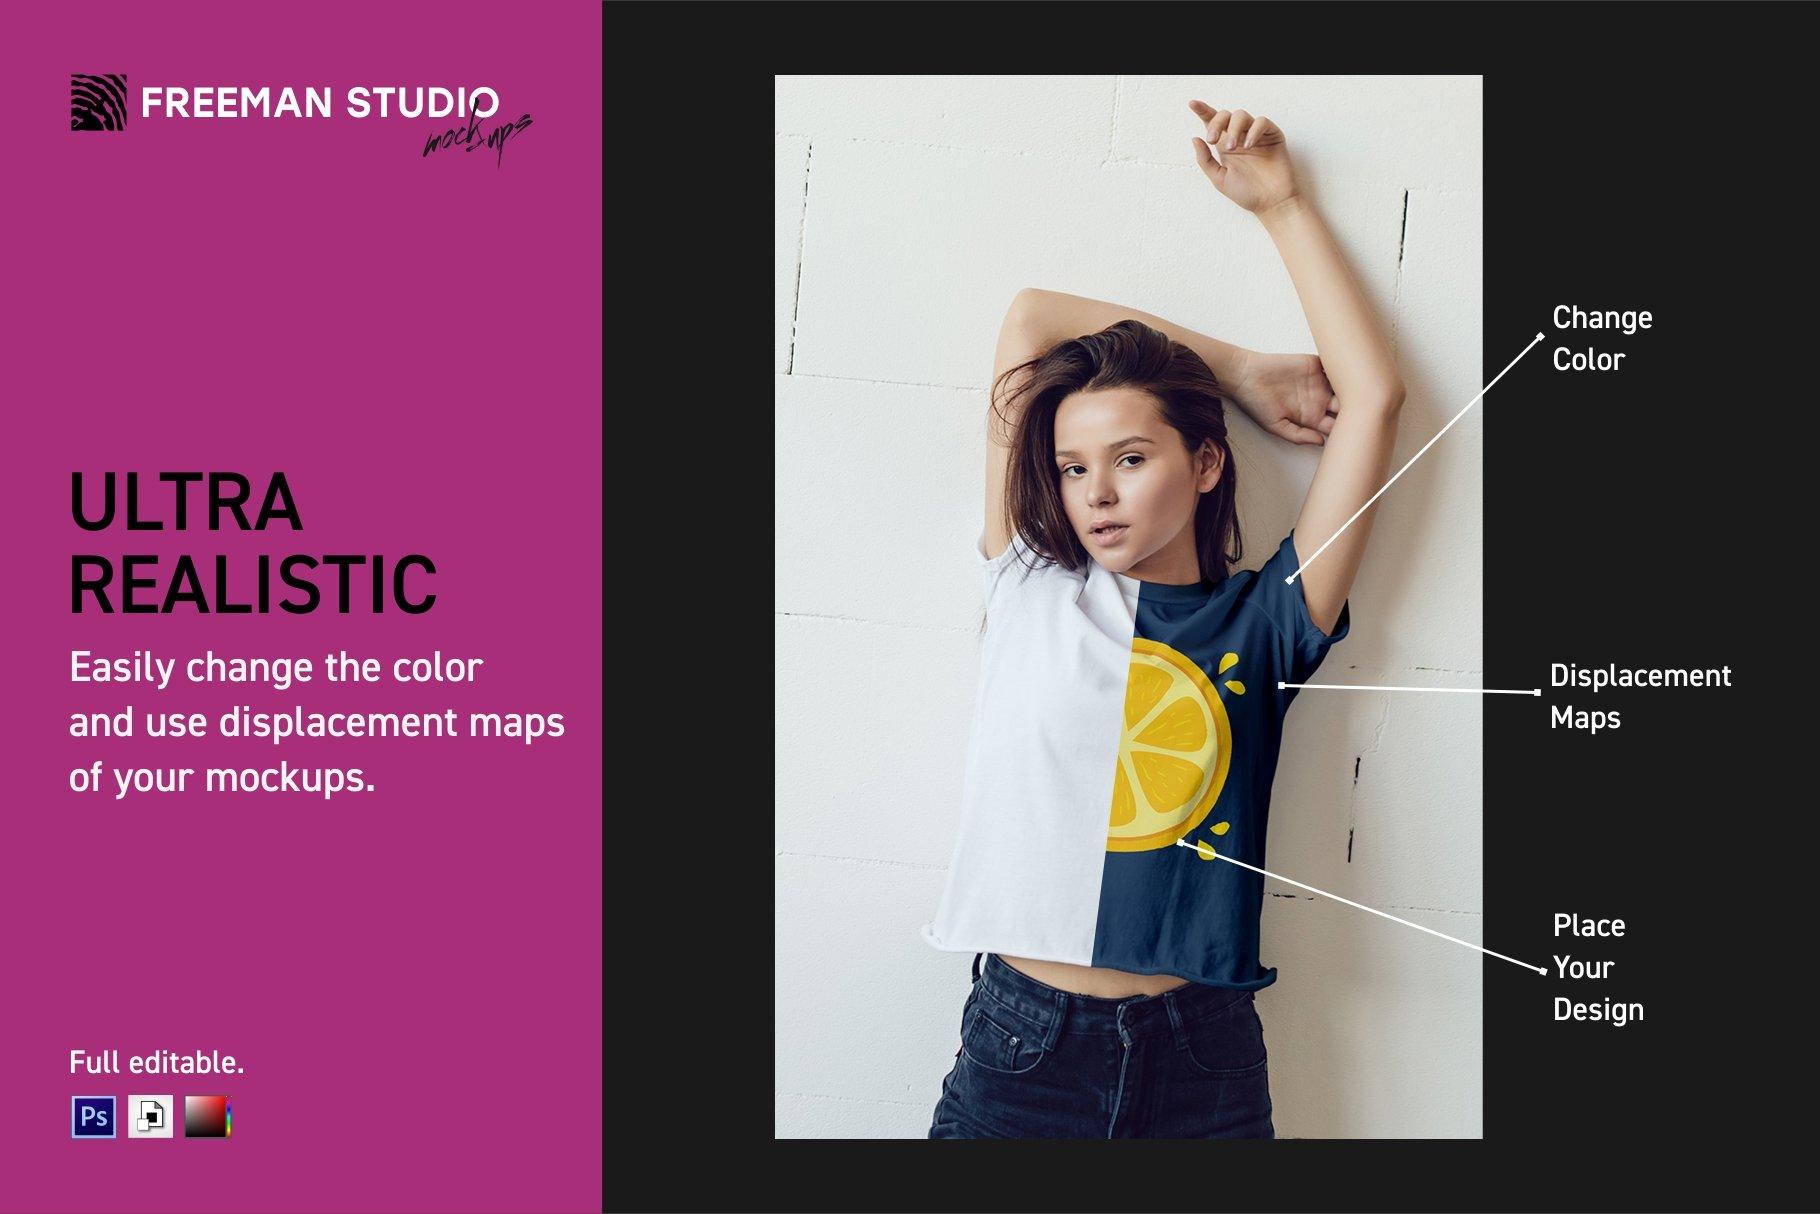 青少年T恤半袖衫印花图案设计展示样机合集 Teenager T-Shirt Mockup Set插图(2)